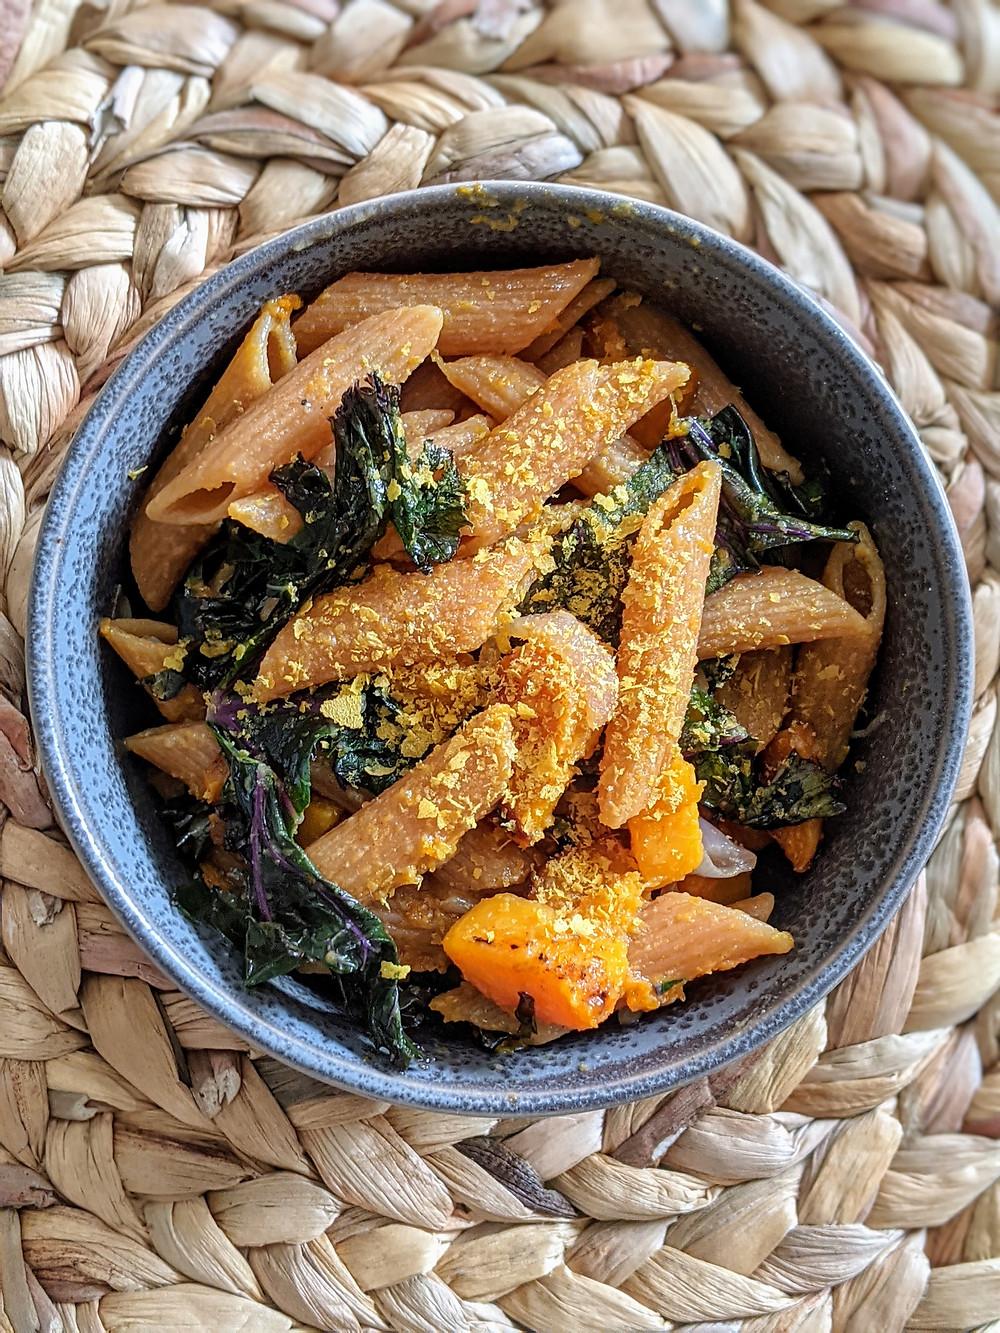 Barilla's red Lentil Pasta with Butternut Squash and Veggies - The Sunday Cookbook - Food Allergy Recipes - Joseph Centineo - Amanda MacGregor